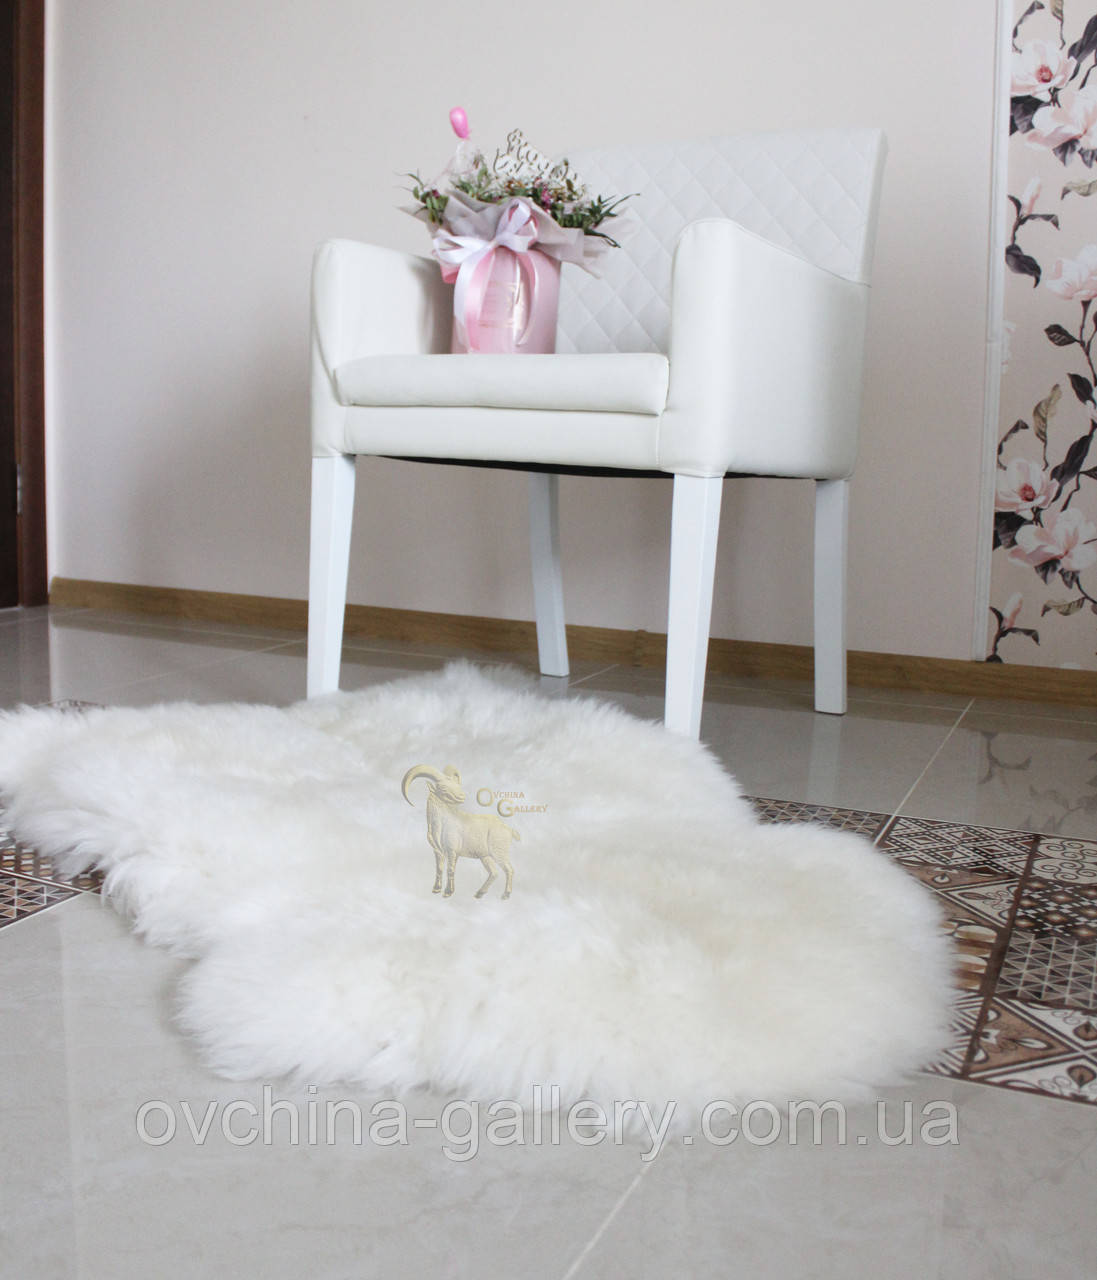 Шкура овечья, белая 120х80